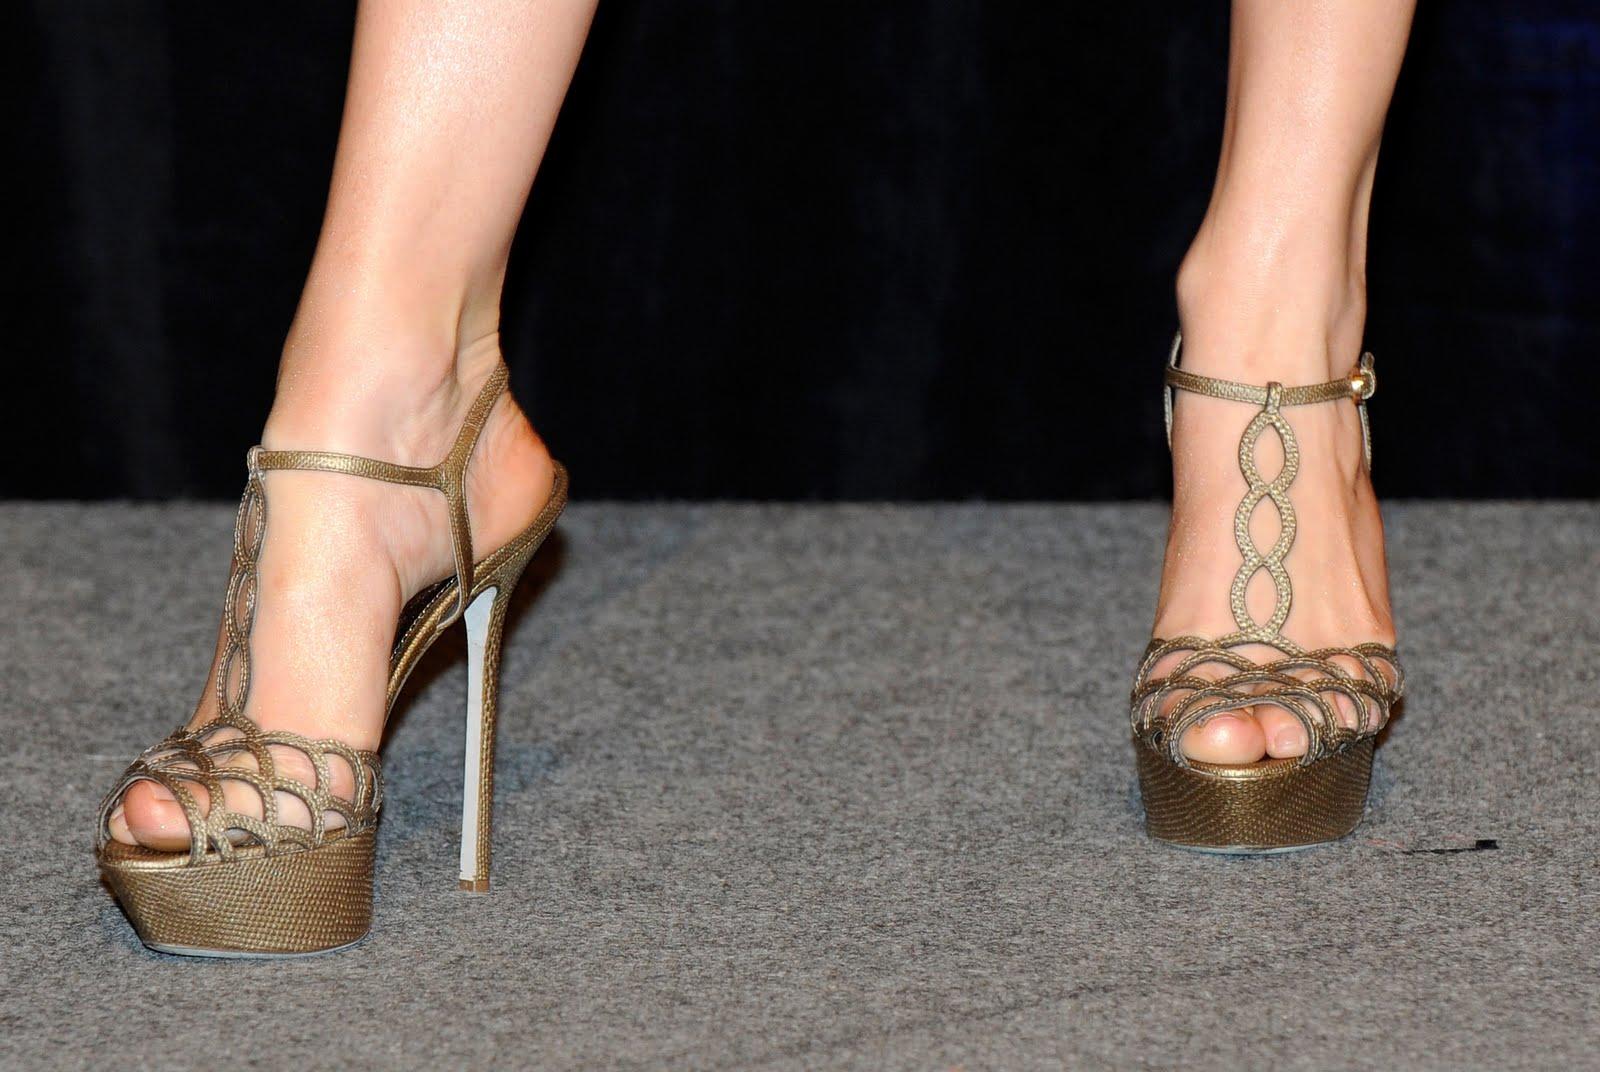 Feet Jennifer Lopeza naked (55 photo), Tits, Leaked, Twitter, legs 2020